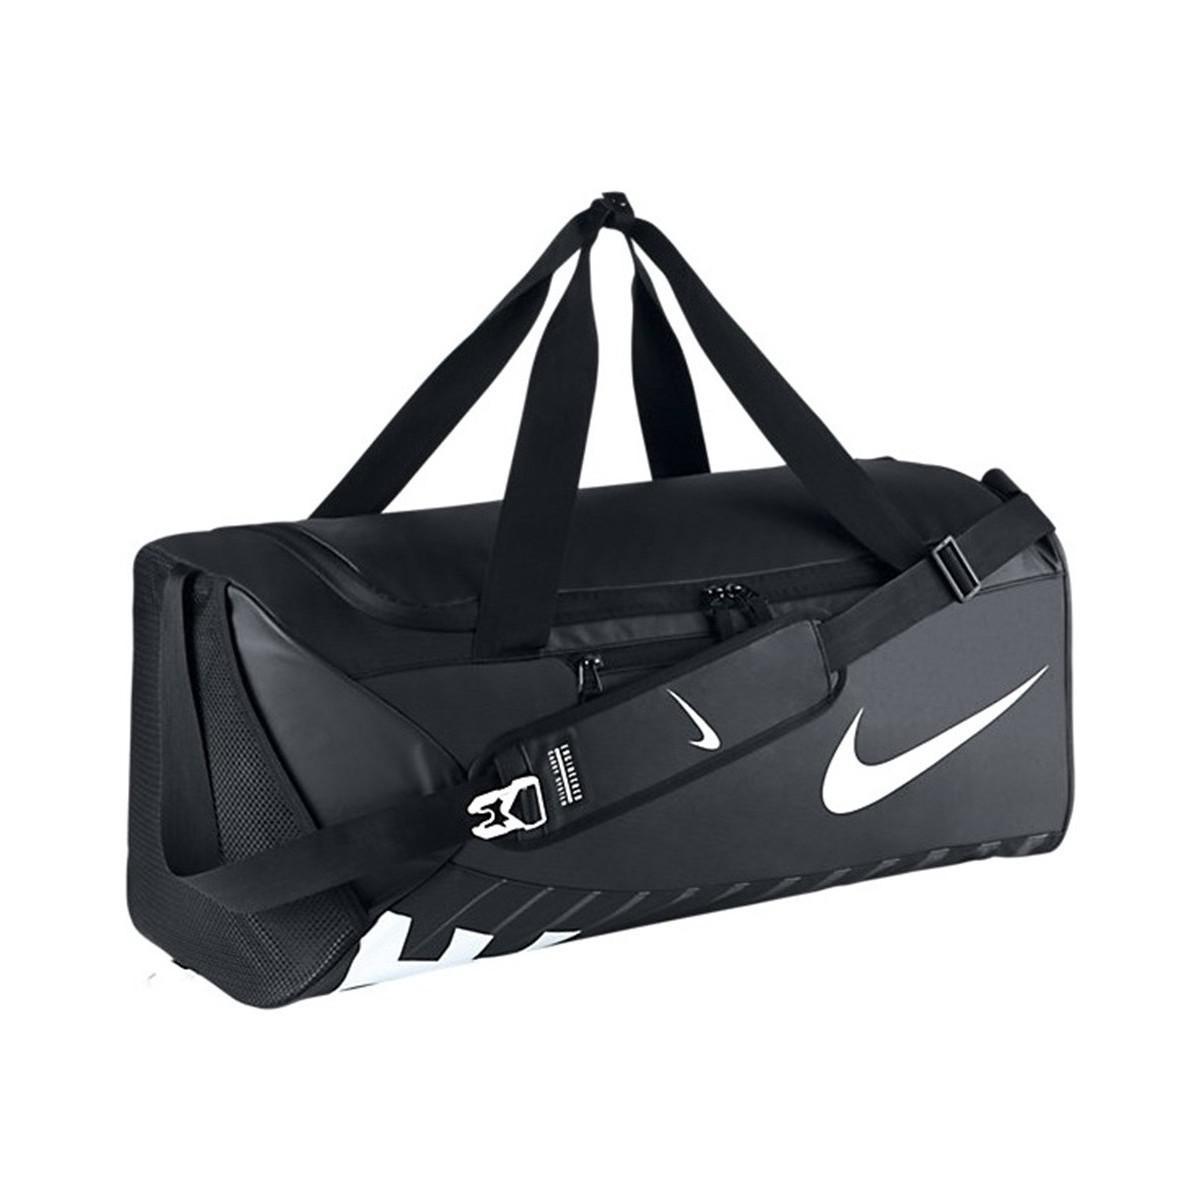 c4b3f1ec9e Nike Alpha Adapt Medium Crossbody Duffle Bag in Black for Men - Lyst